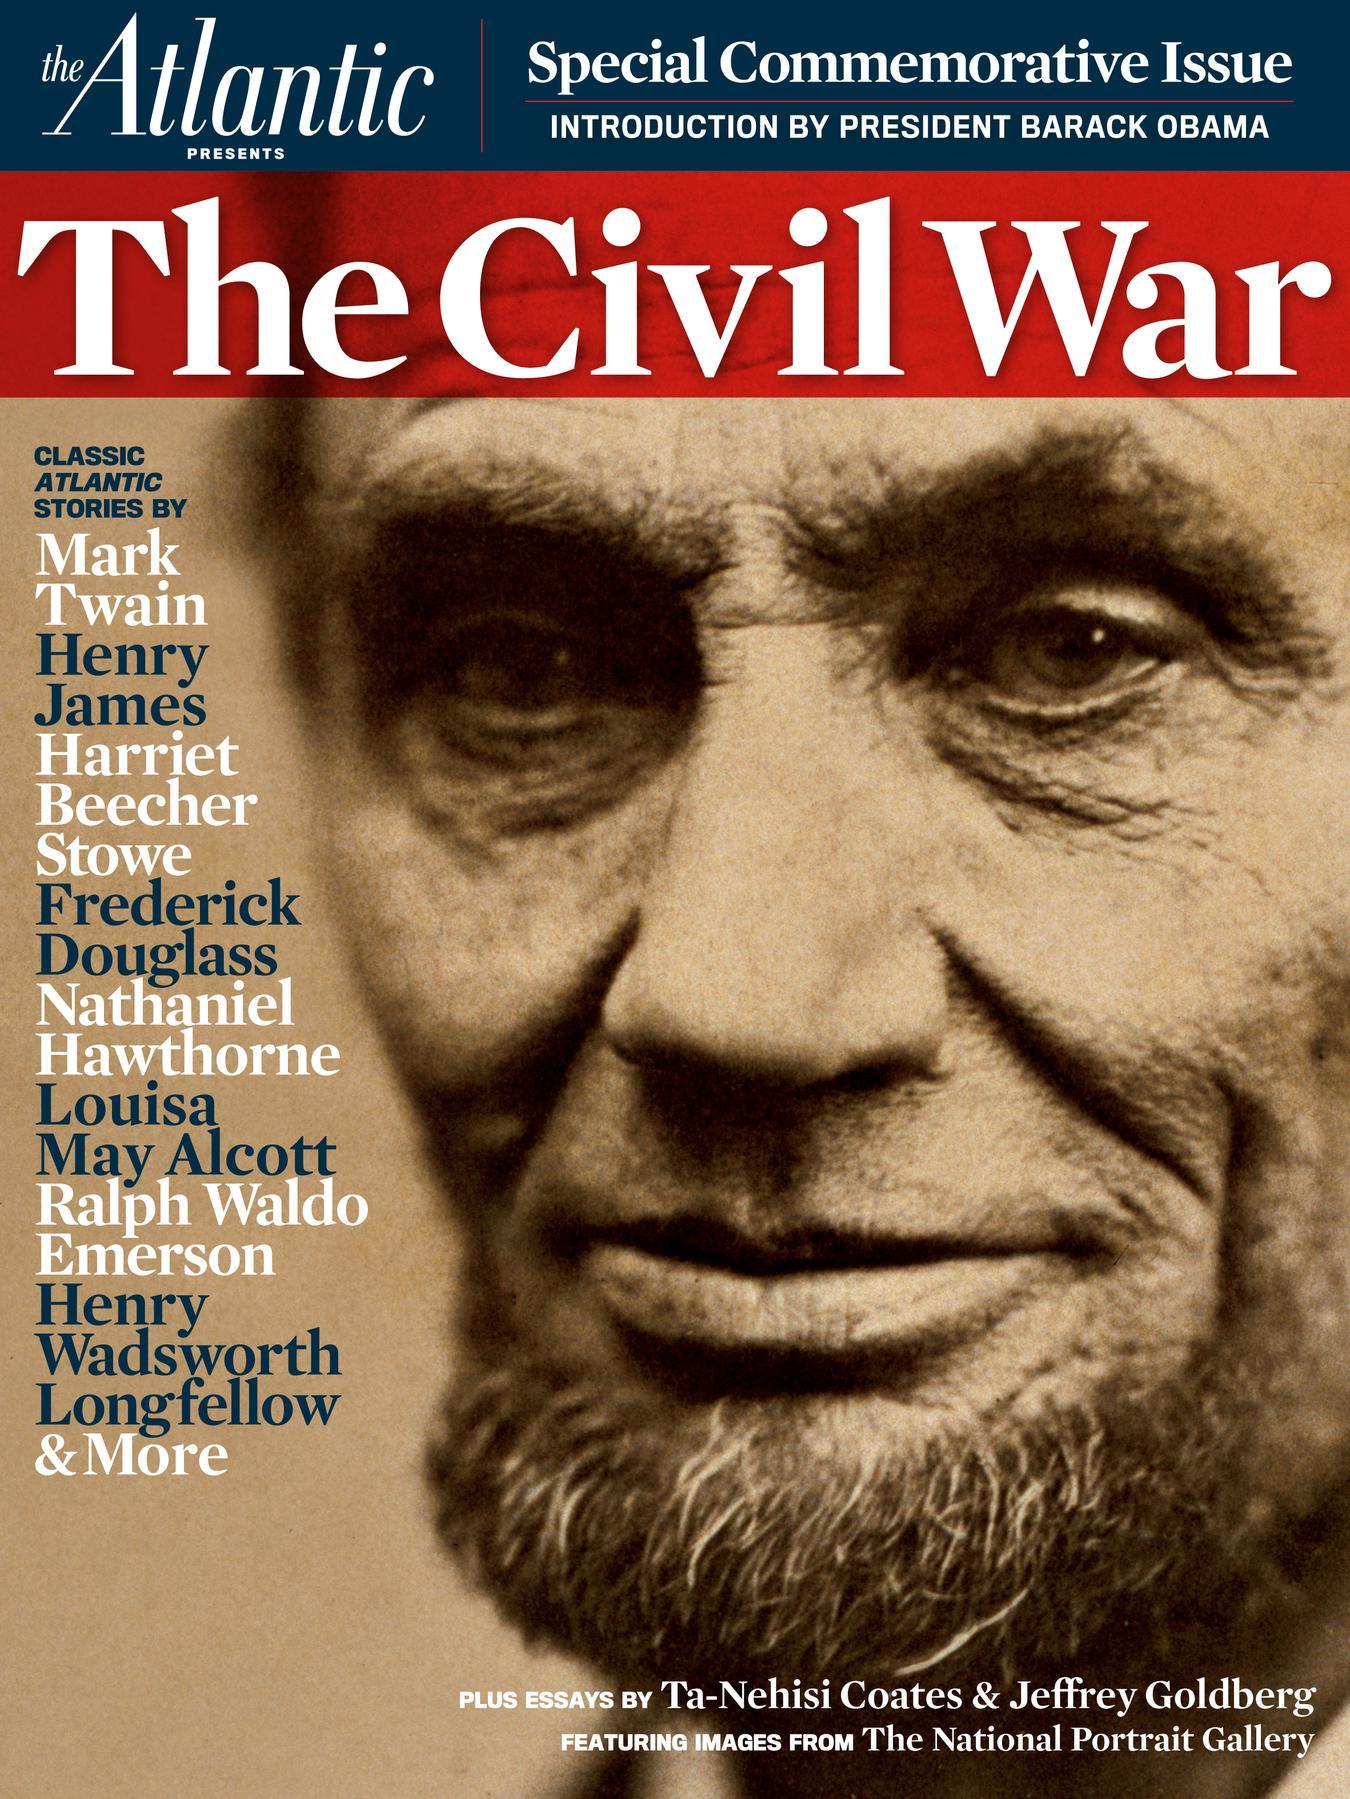 The Civil War Issue  The Atlantic